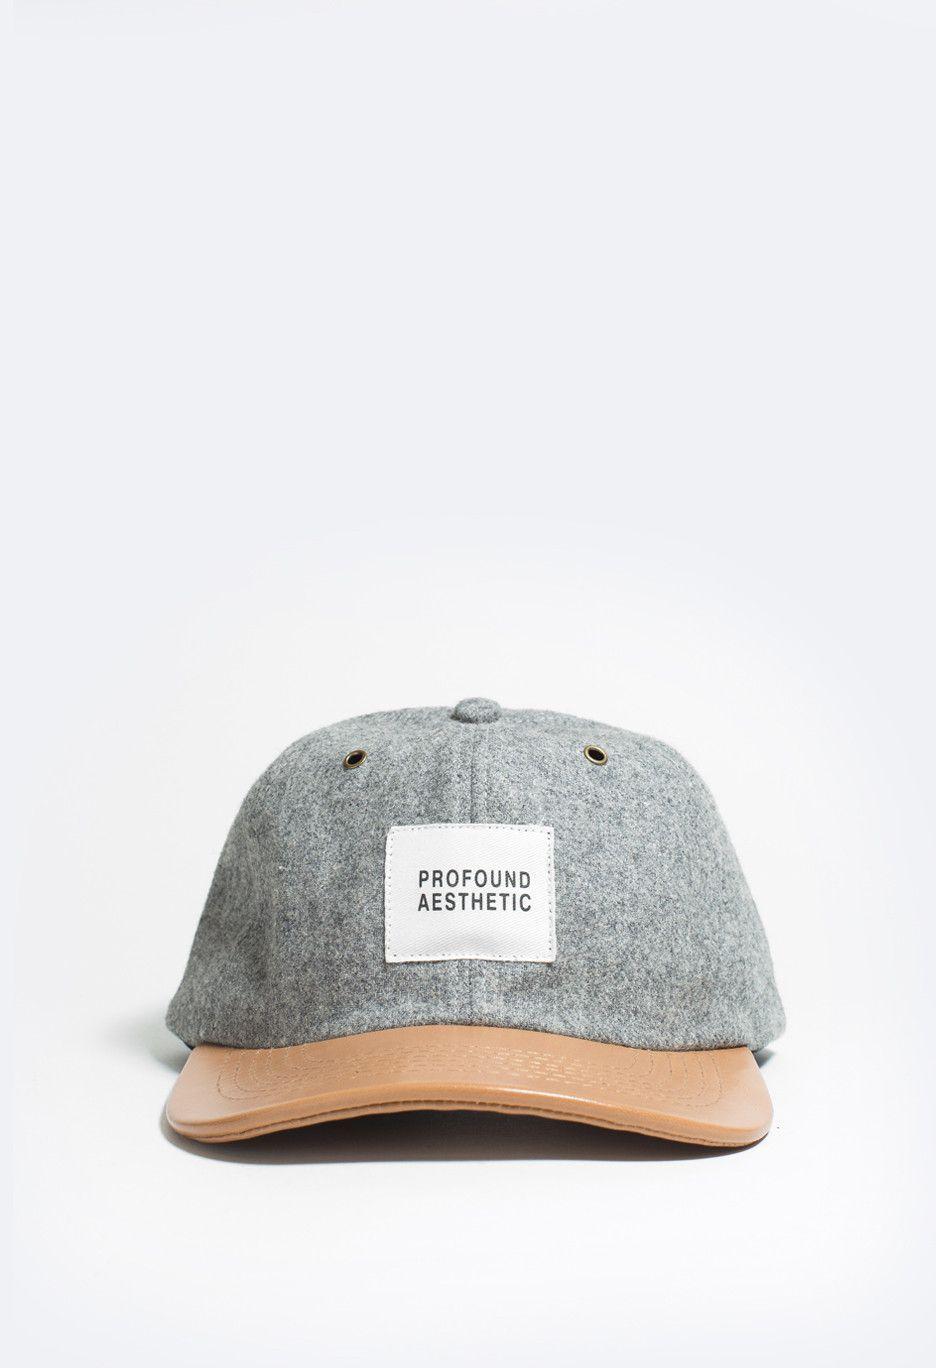 wool flannel gray baseball hat baseball hats and flannels